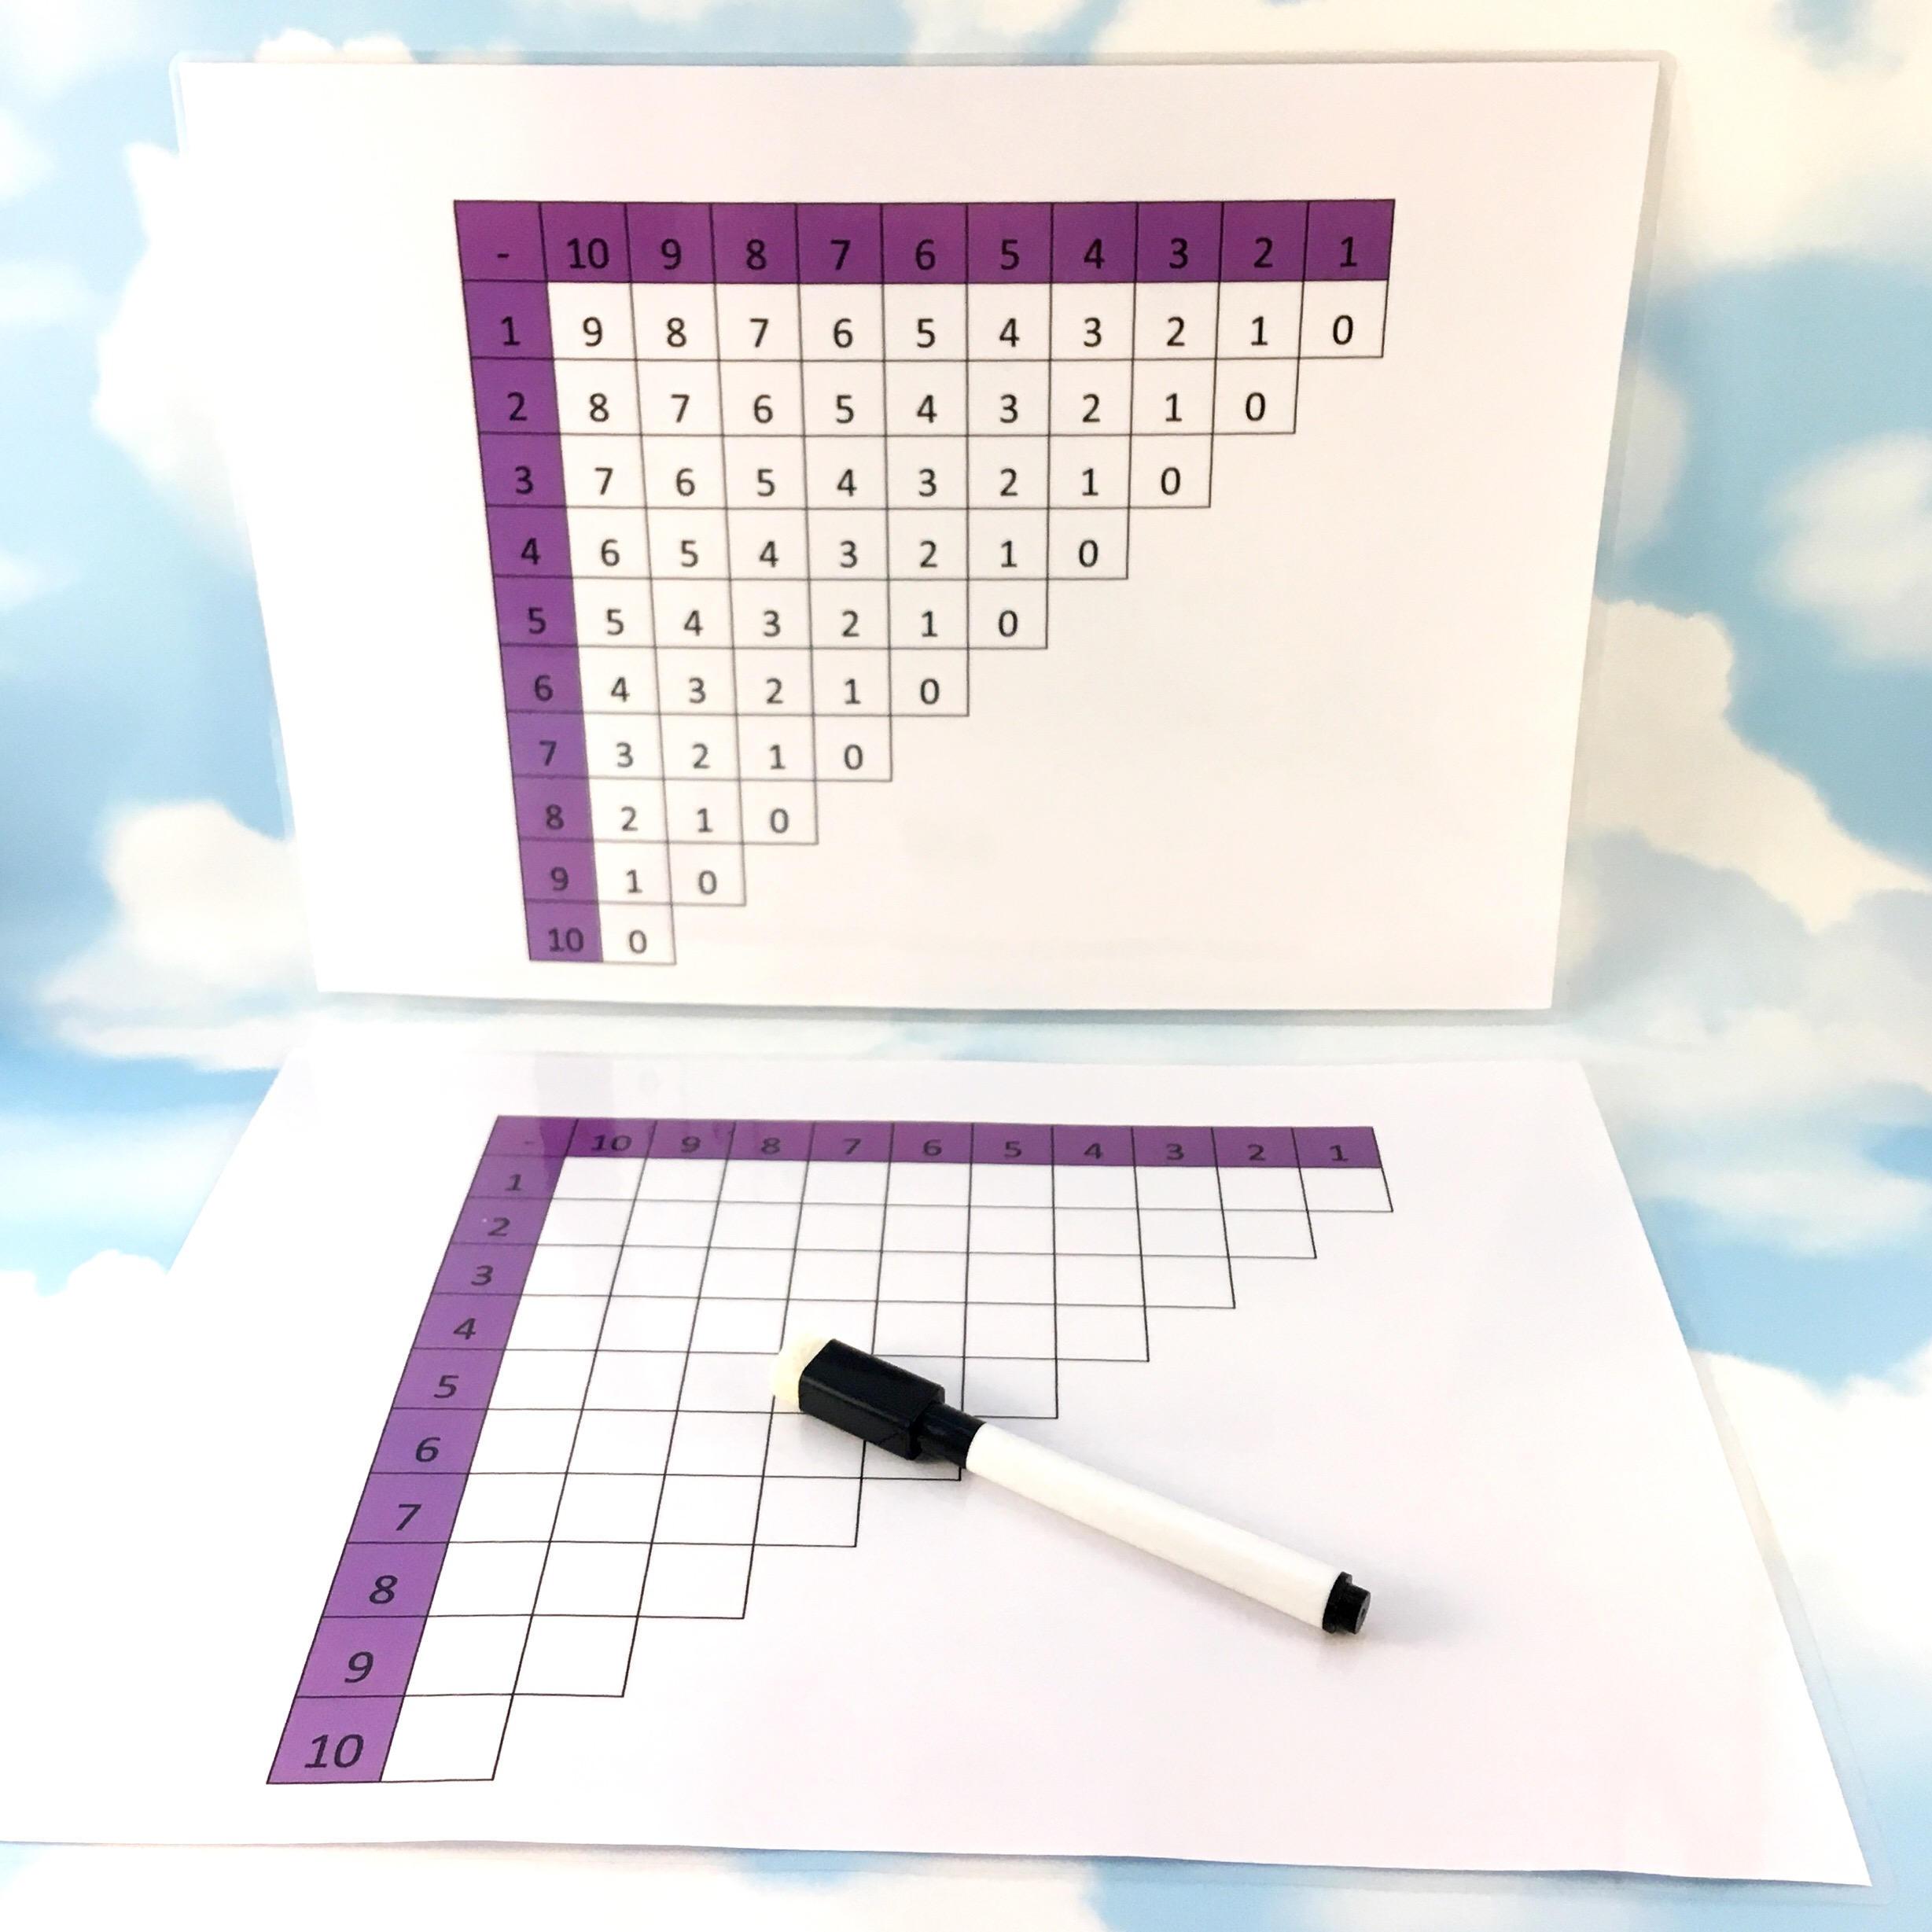 Großzügig Schlüsselstufe 2 Mathematik Arbeitsblätter Drucken Ideen ...